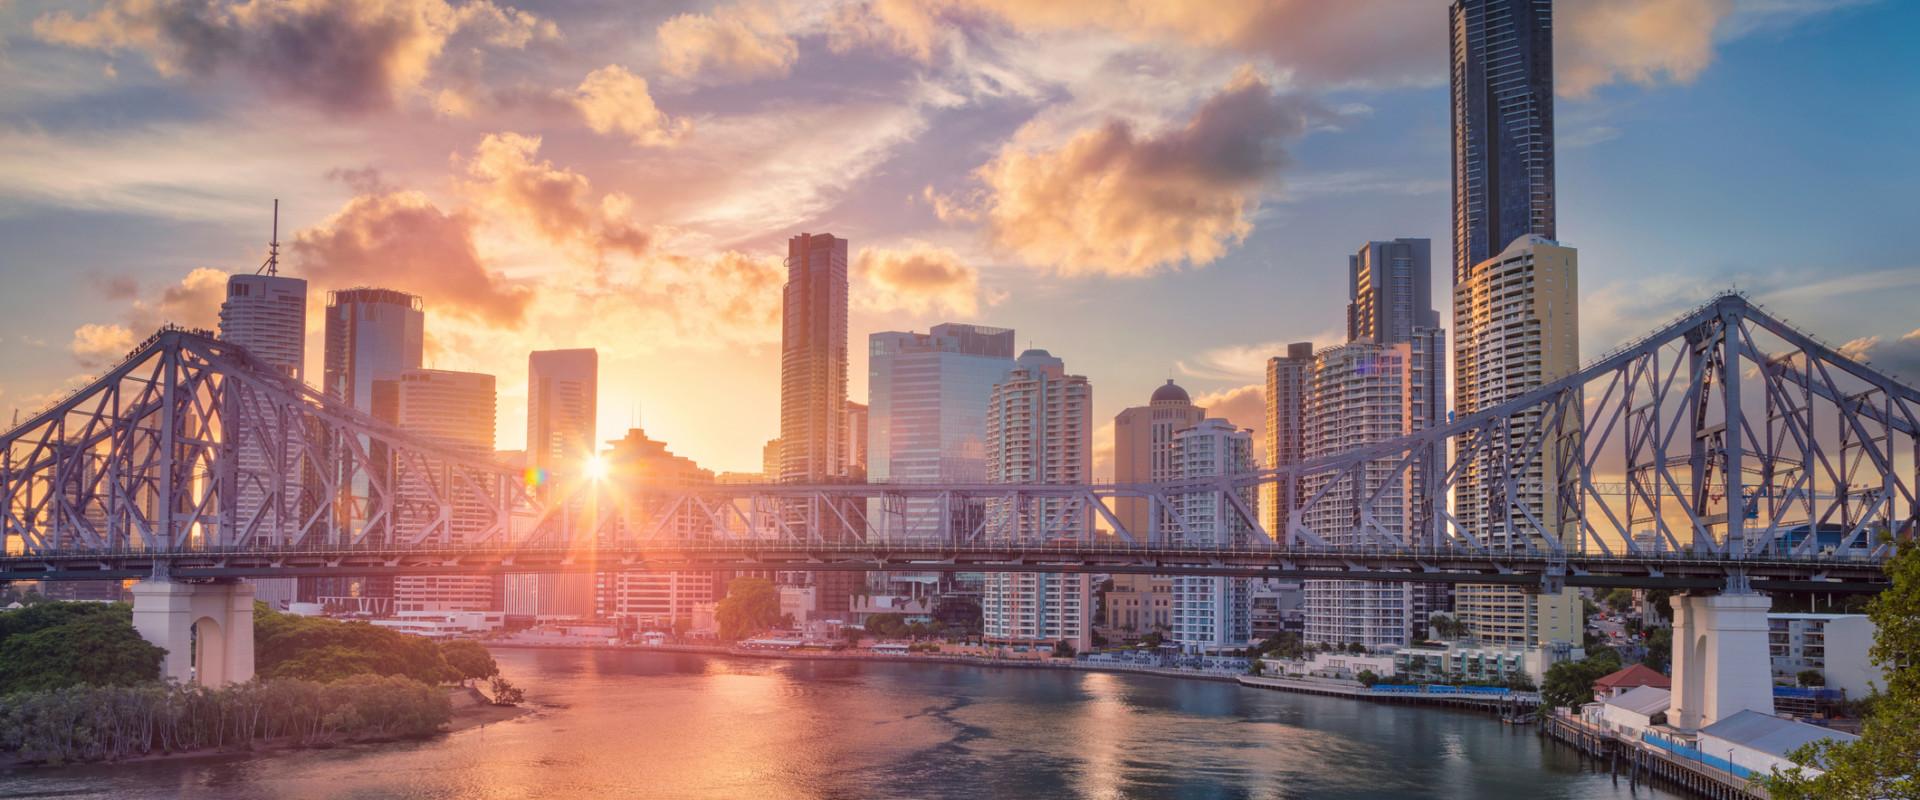 Brisbane River City View